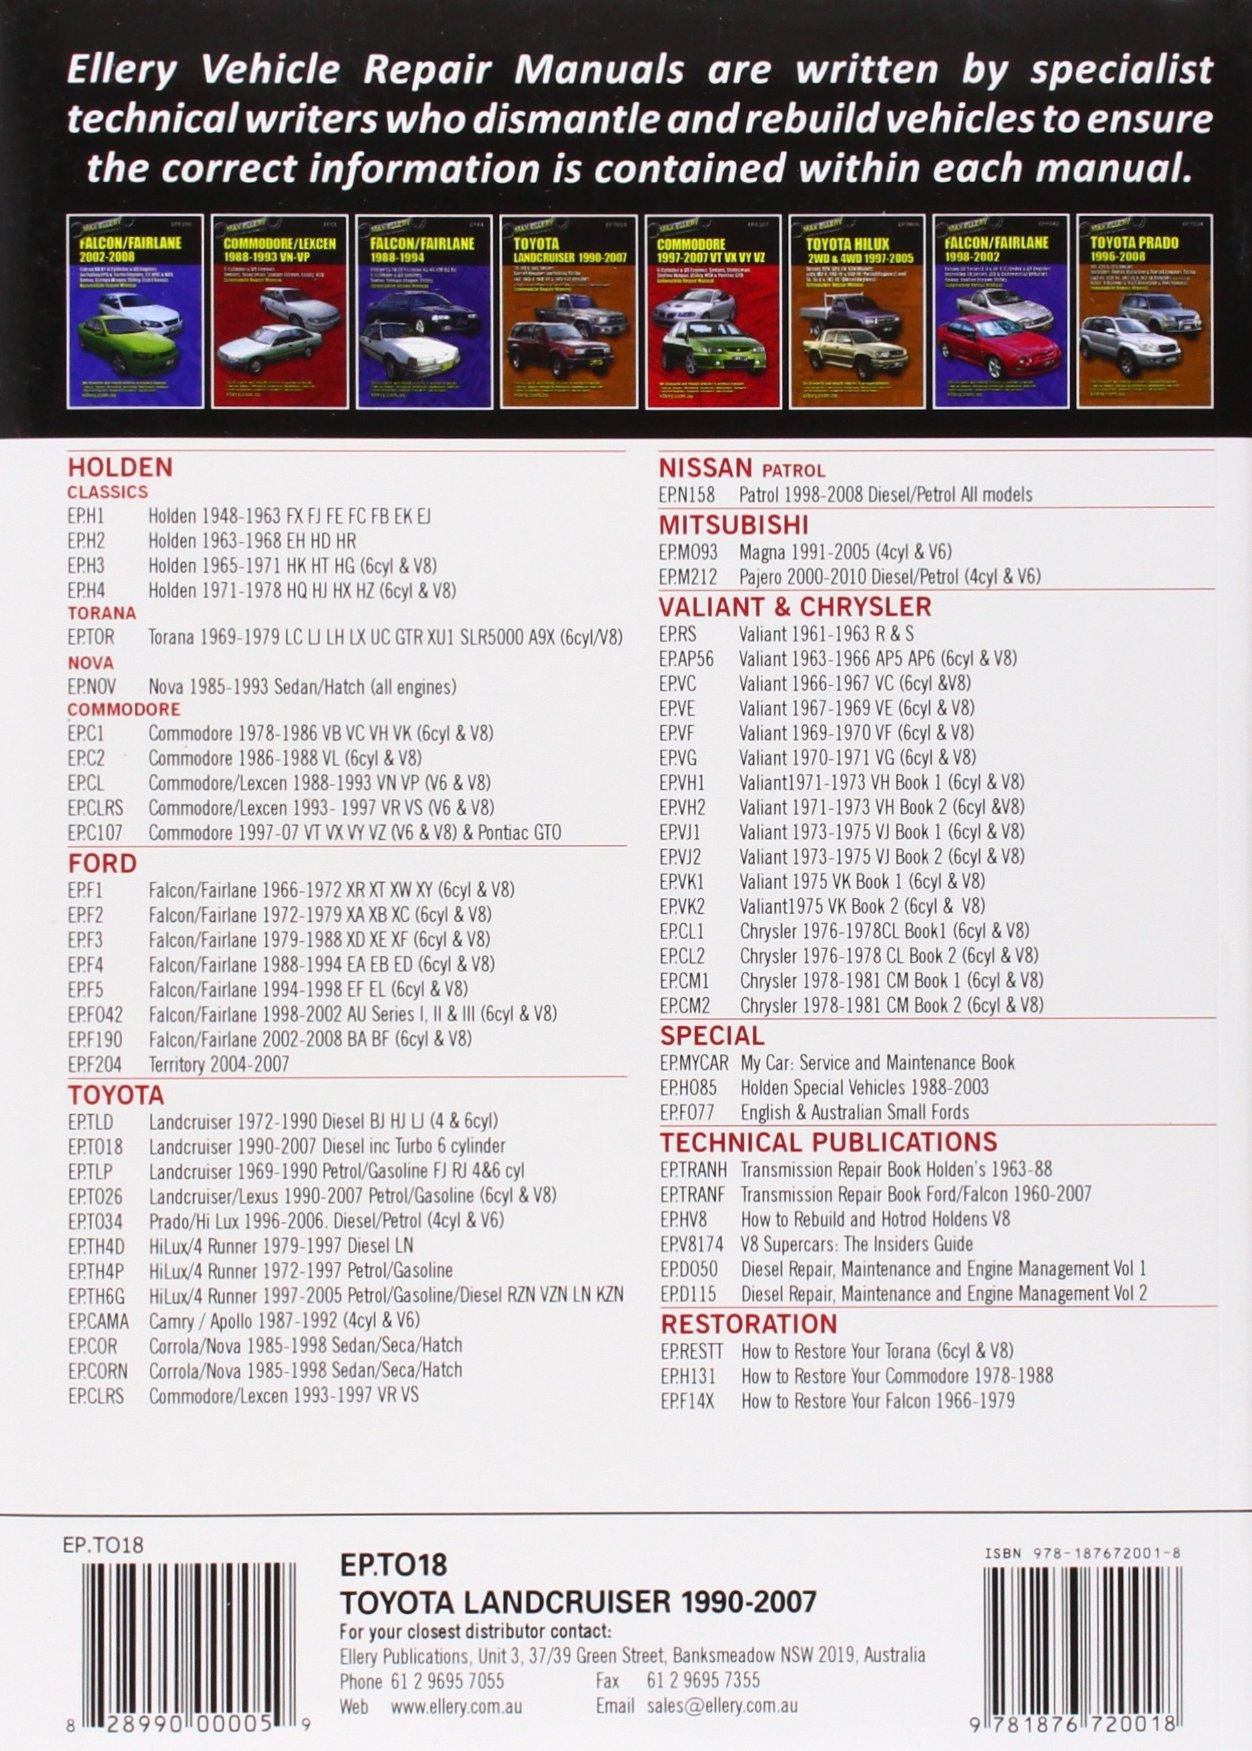 Toyota Landcruiser 1990-2007 Automobile Repair Manual: Diesel Engines Including Turbo: 70s, 80s, and 100s Series: Amazon.es: Max Ellery: Libros en ...